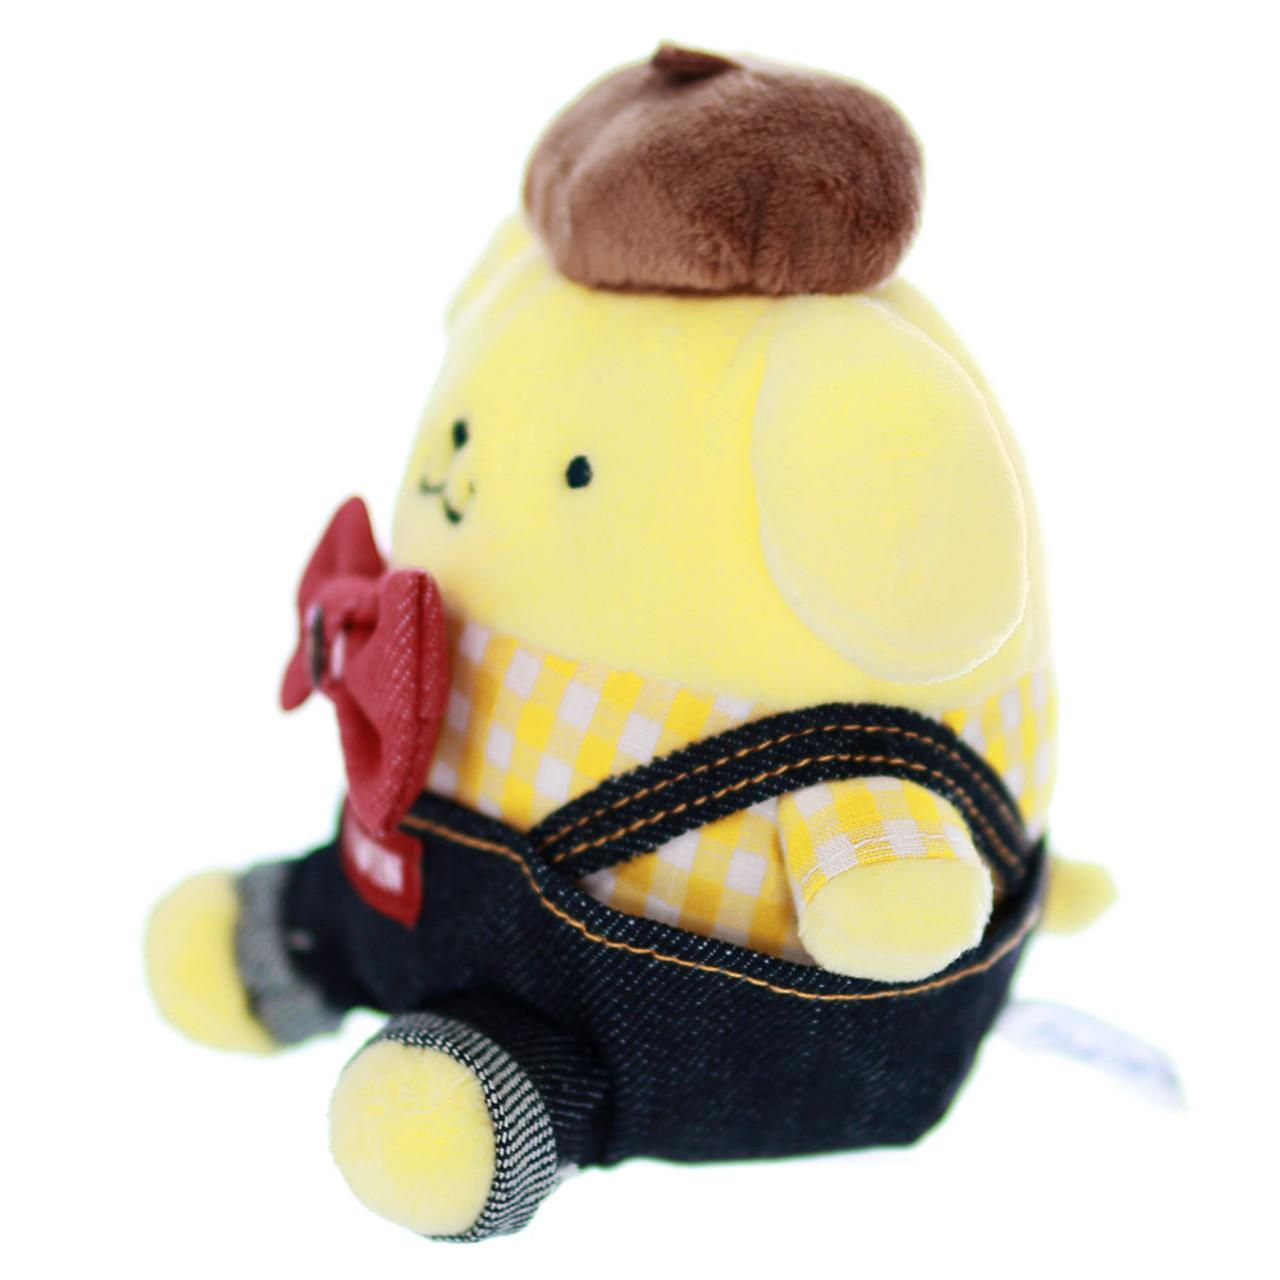 Sanrio PomPomPurin x Edwin Denim Dungarees Stuffed Animal Toy ( Side View )